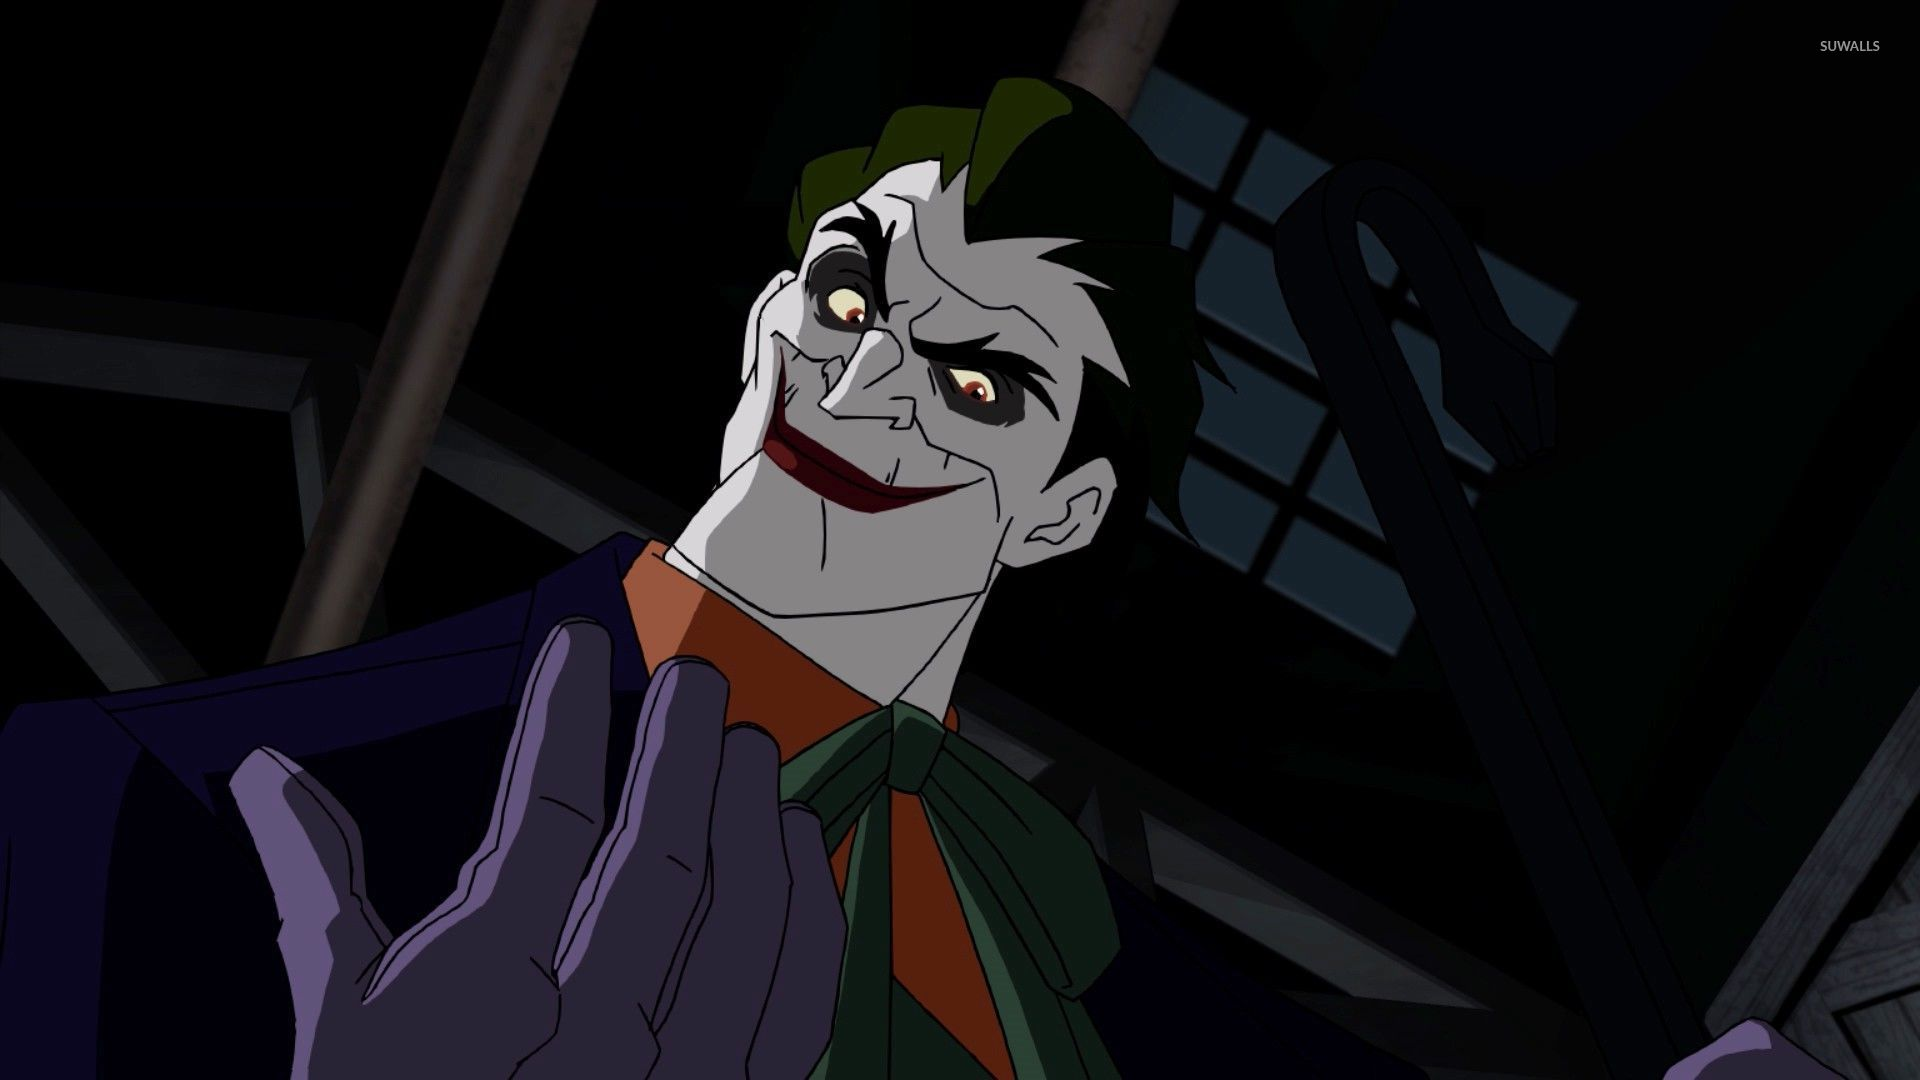 The Joker in Batman Under the Red Hood wallpaper 1920x1080